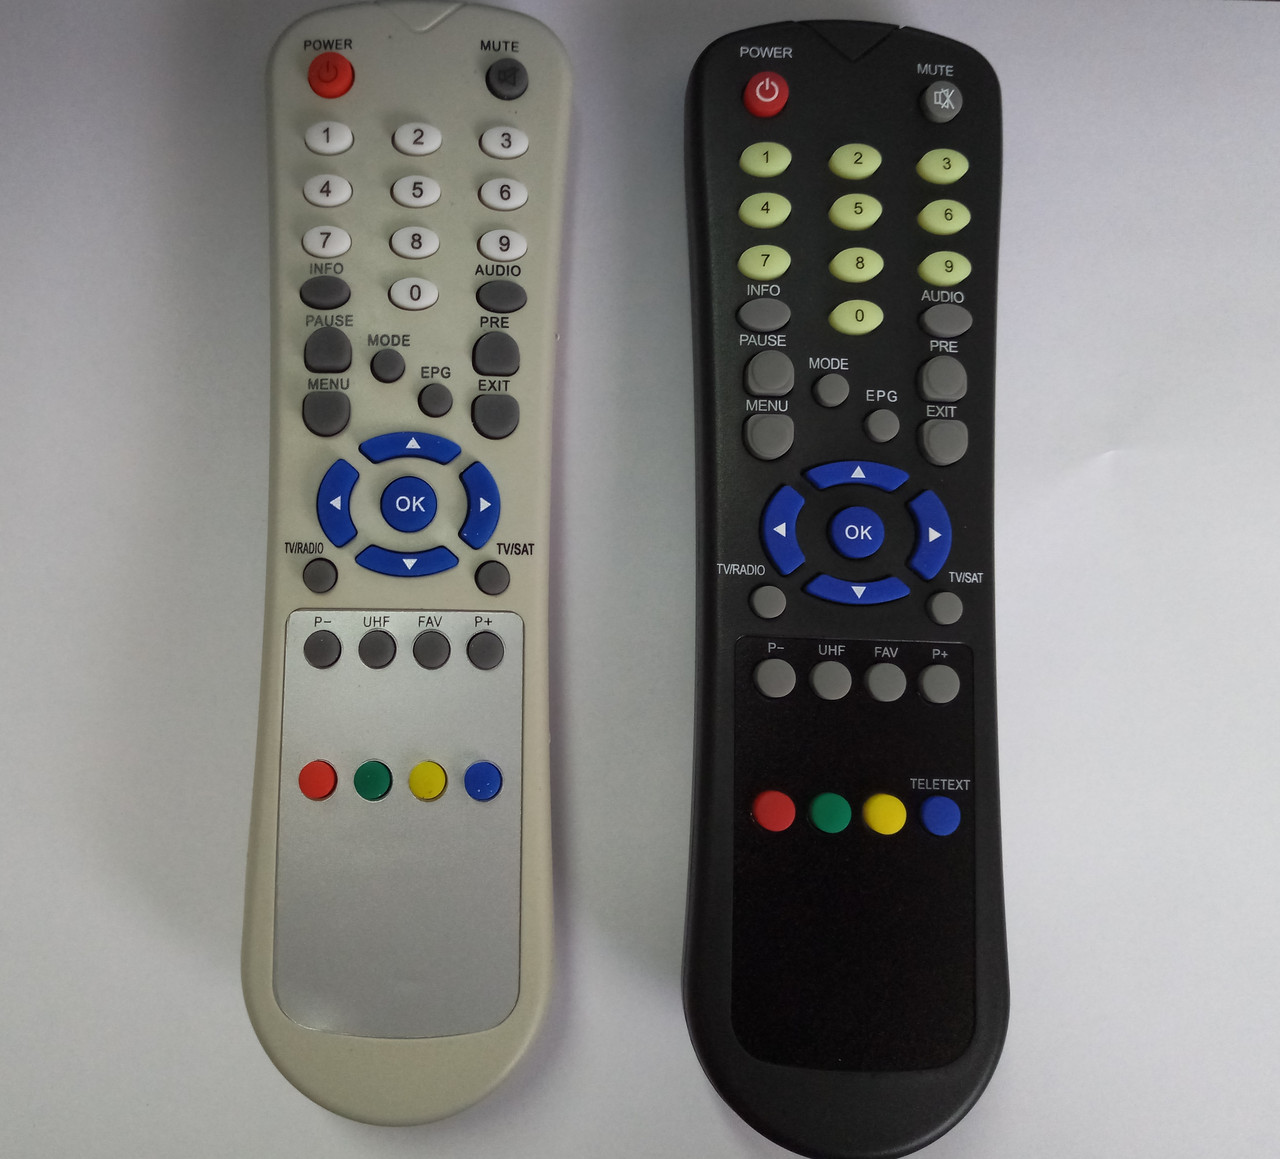 Пульт ДУ для Globo 6000 Startrack 550D